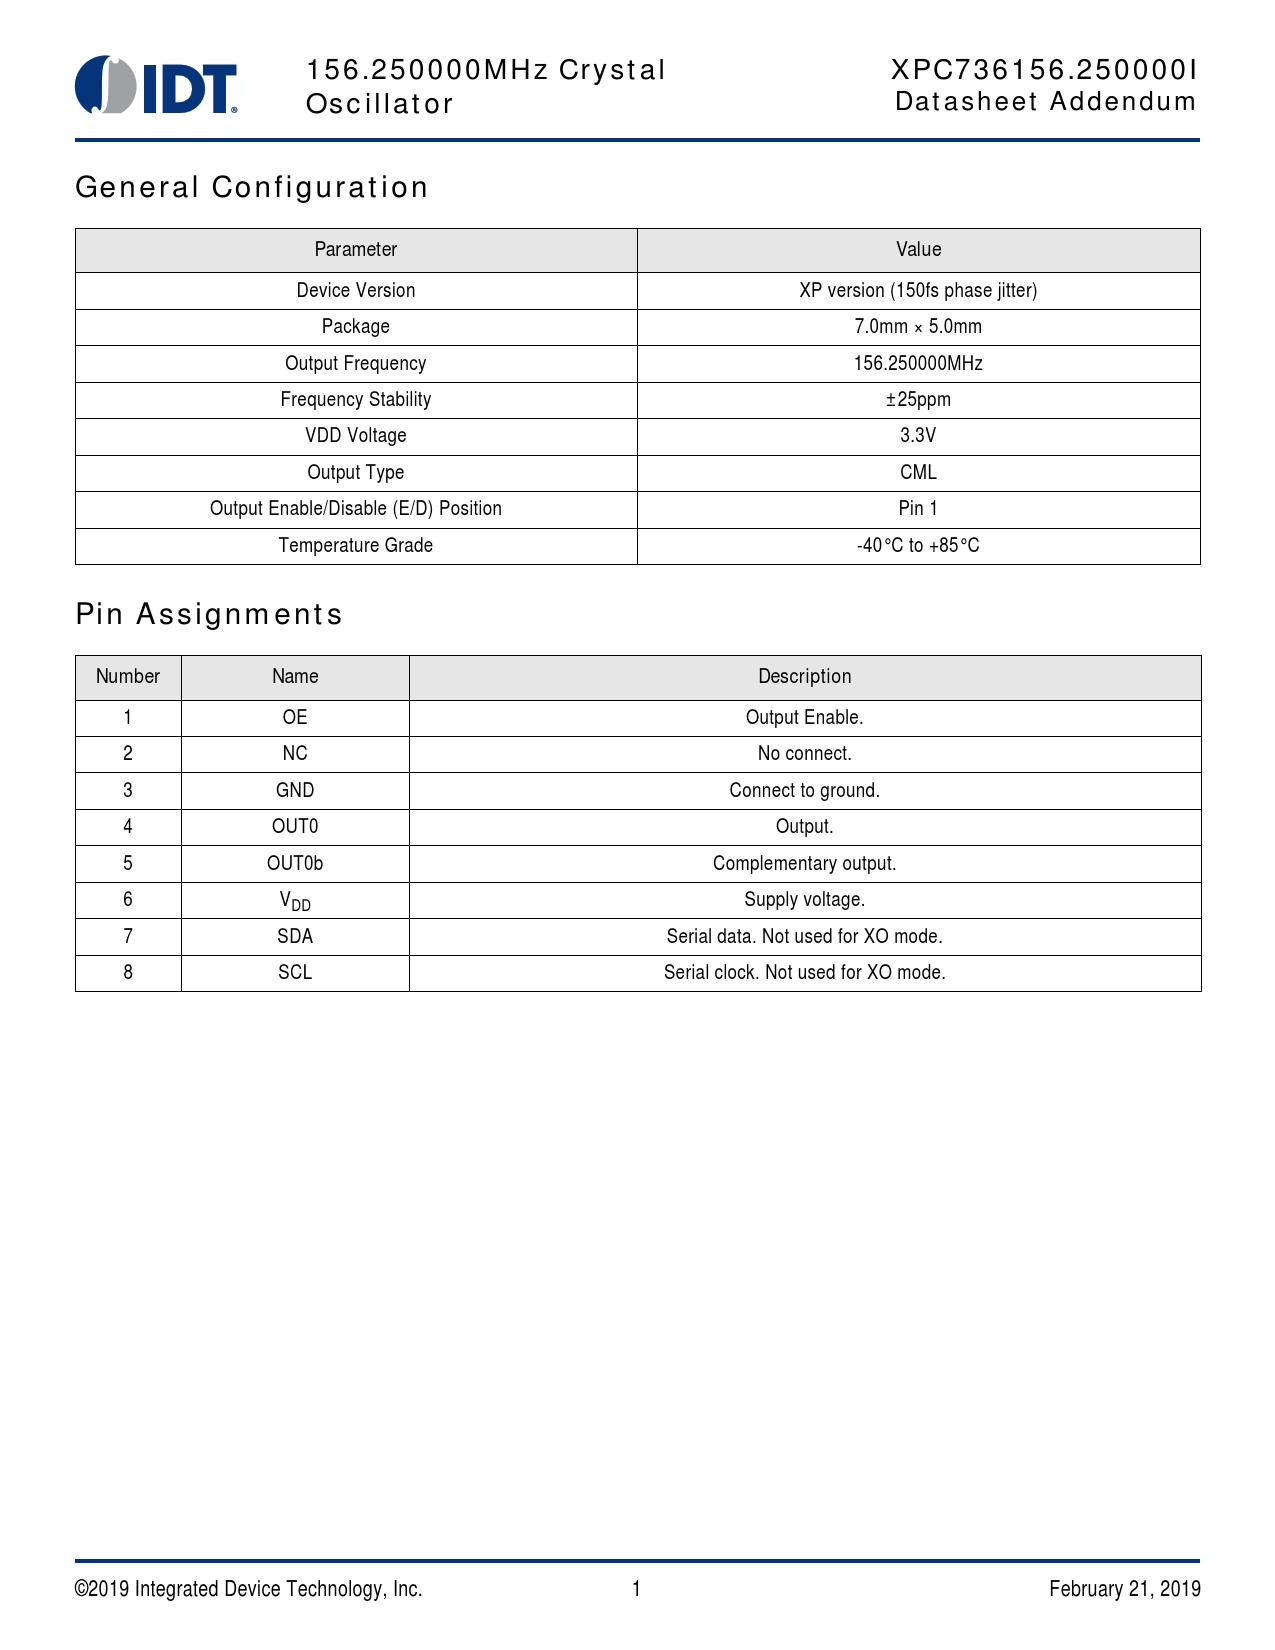 Datasheet Addendum XPC736156.250000I IDT